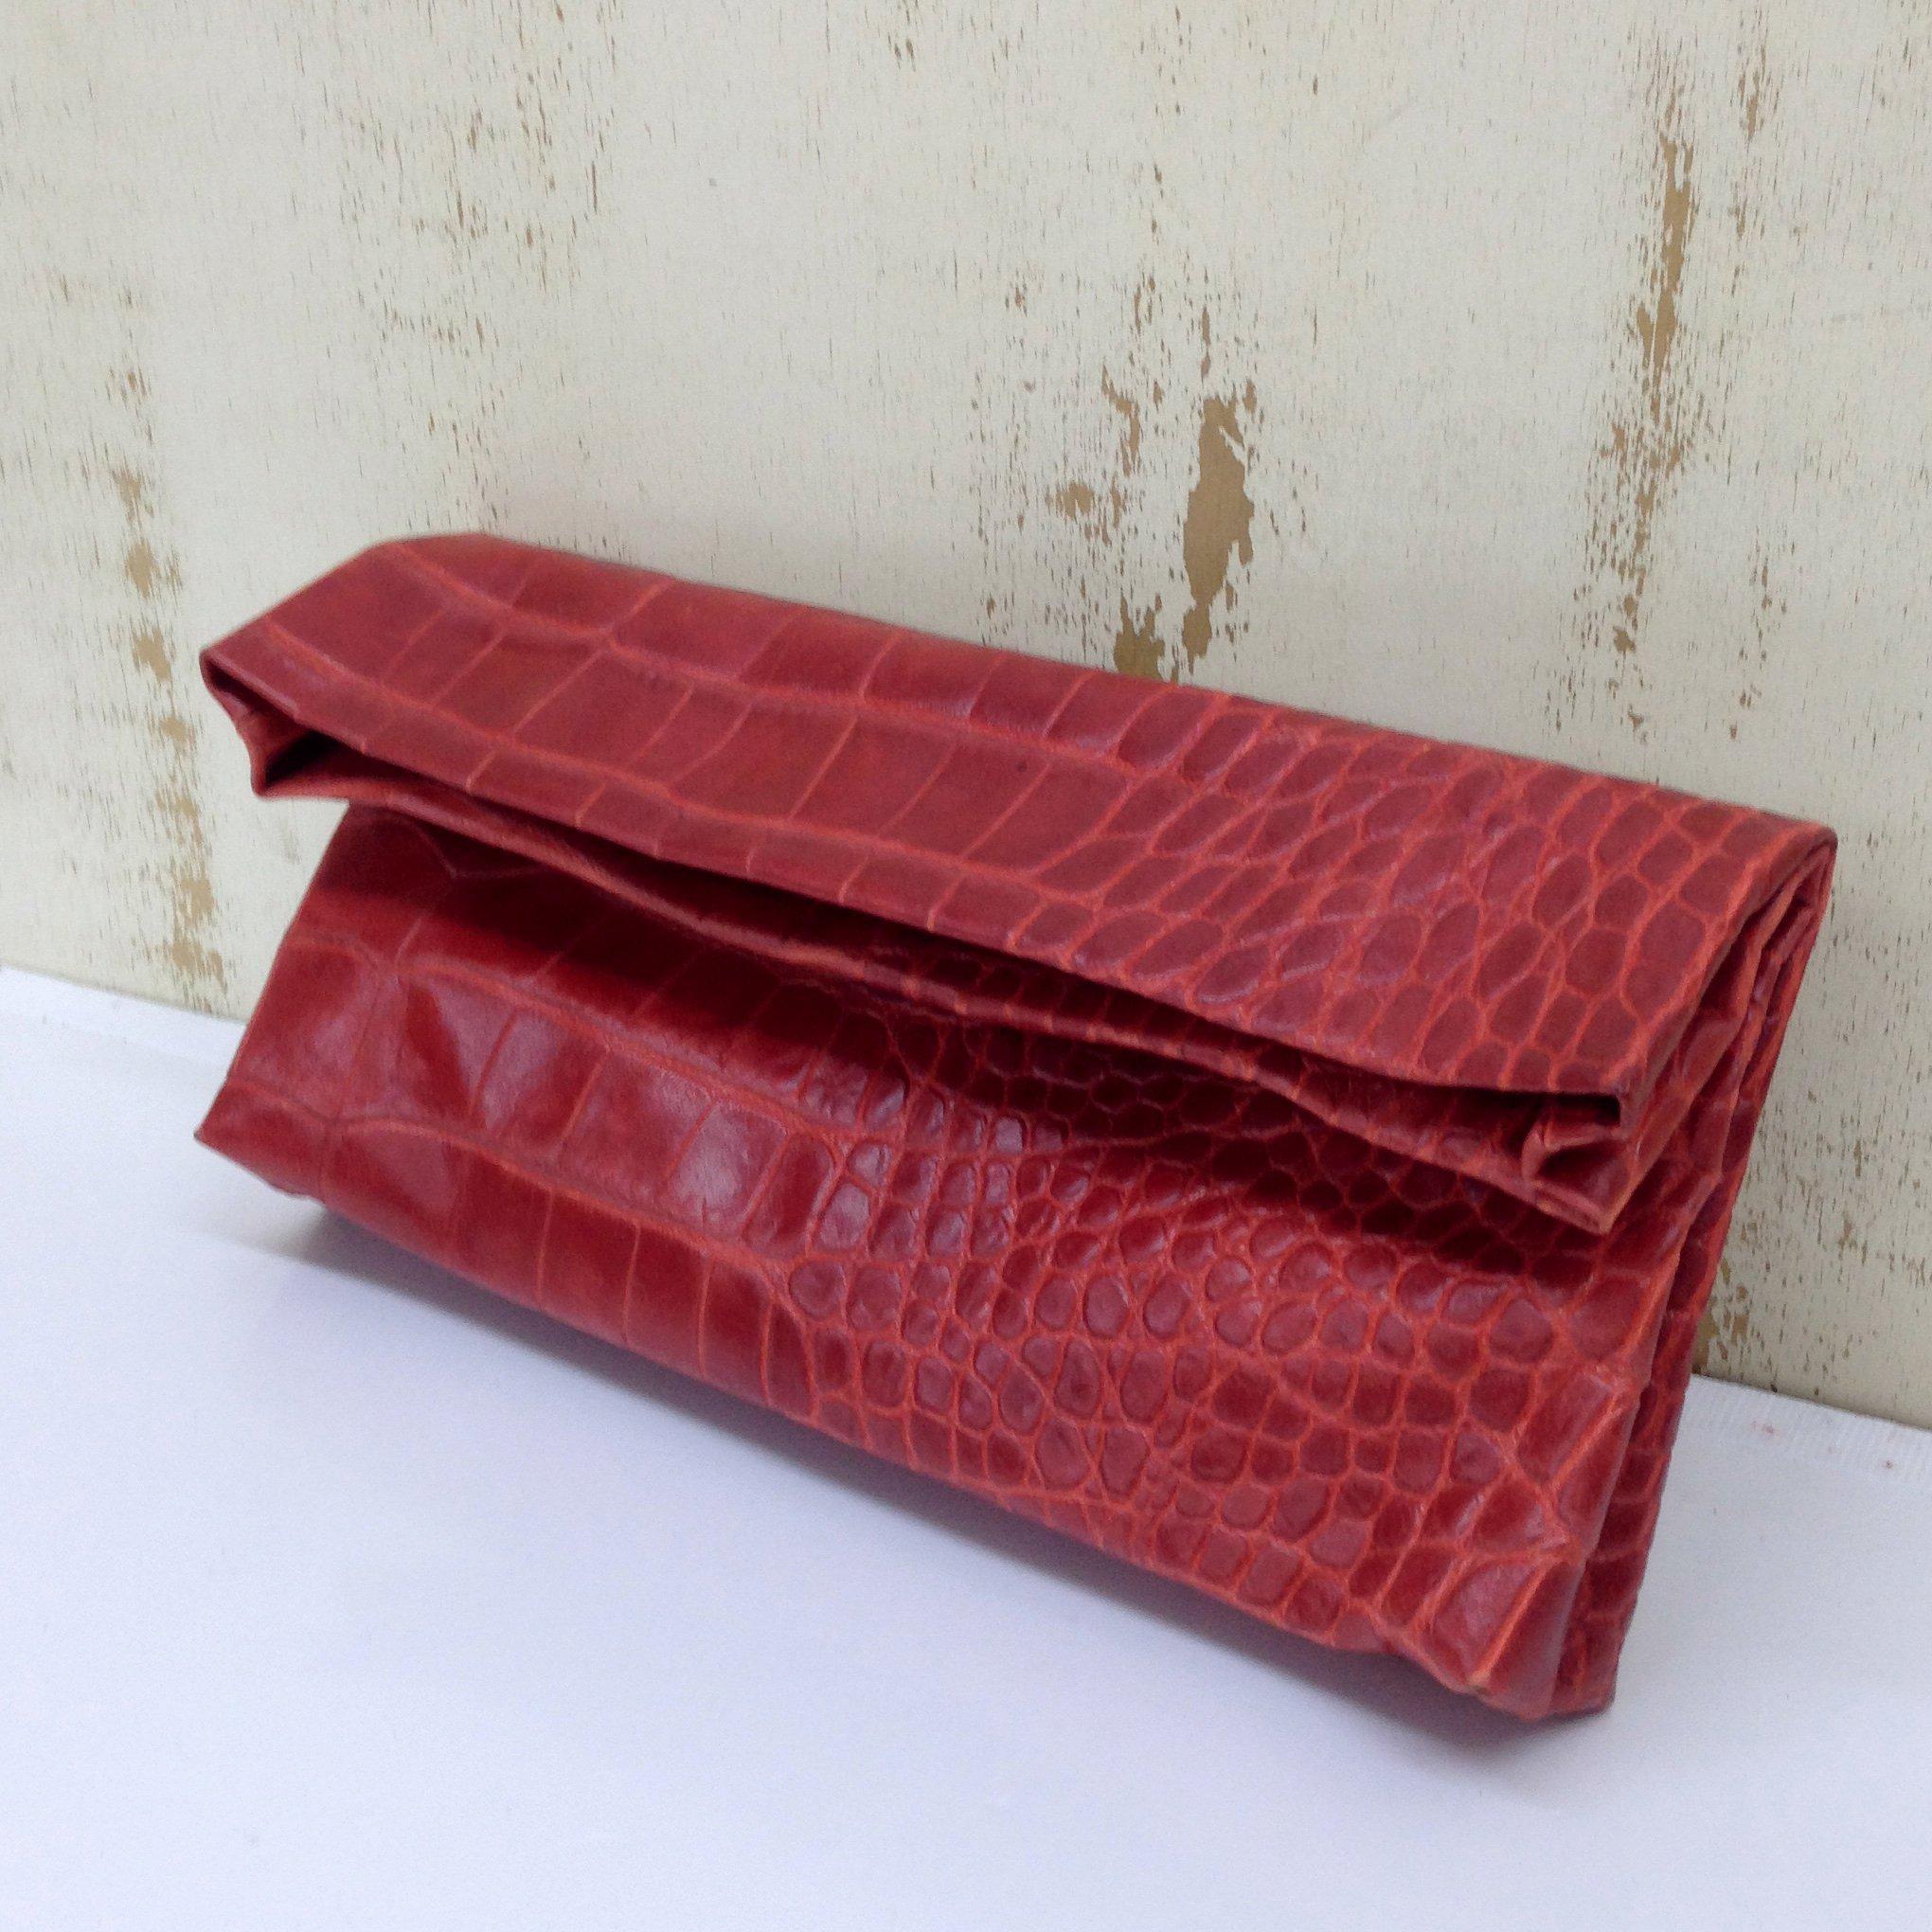 Foldover red Leather Clutch Handbag purse Crocodile Shoulder handbag Printed croco skin